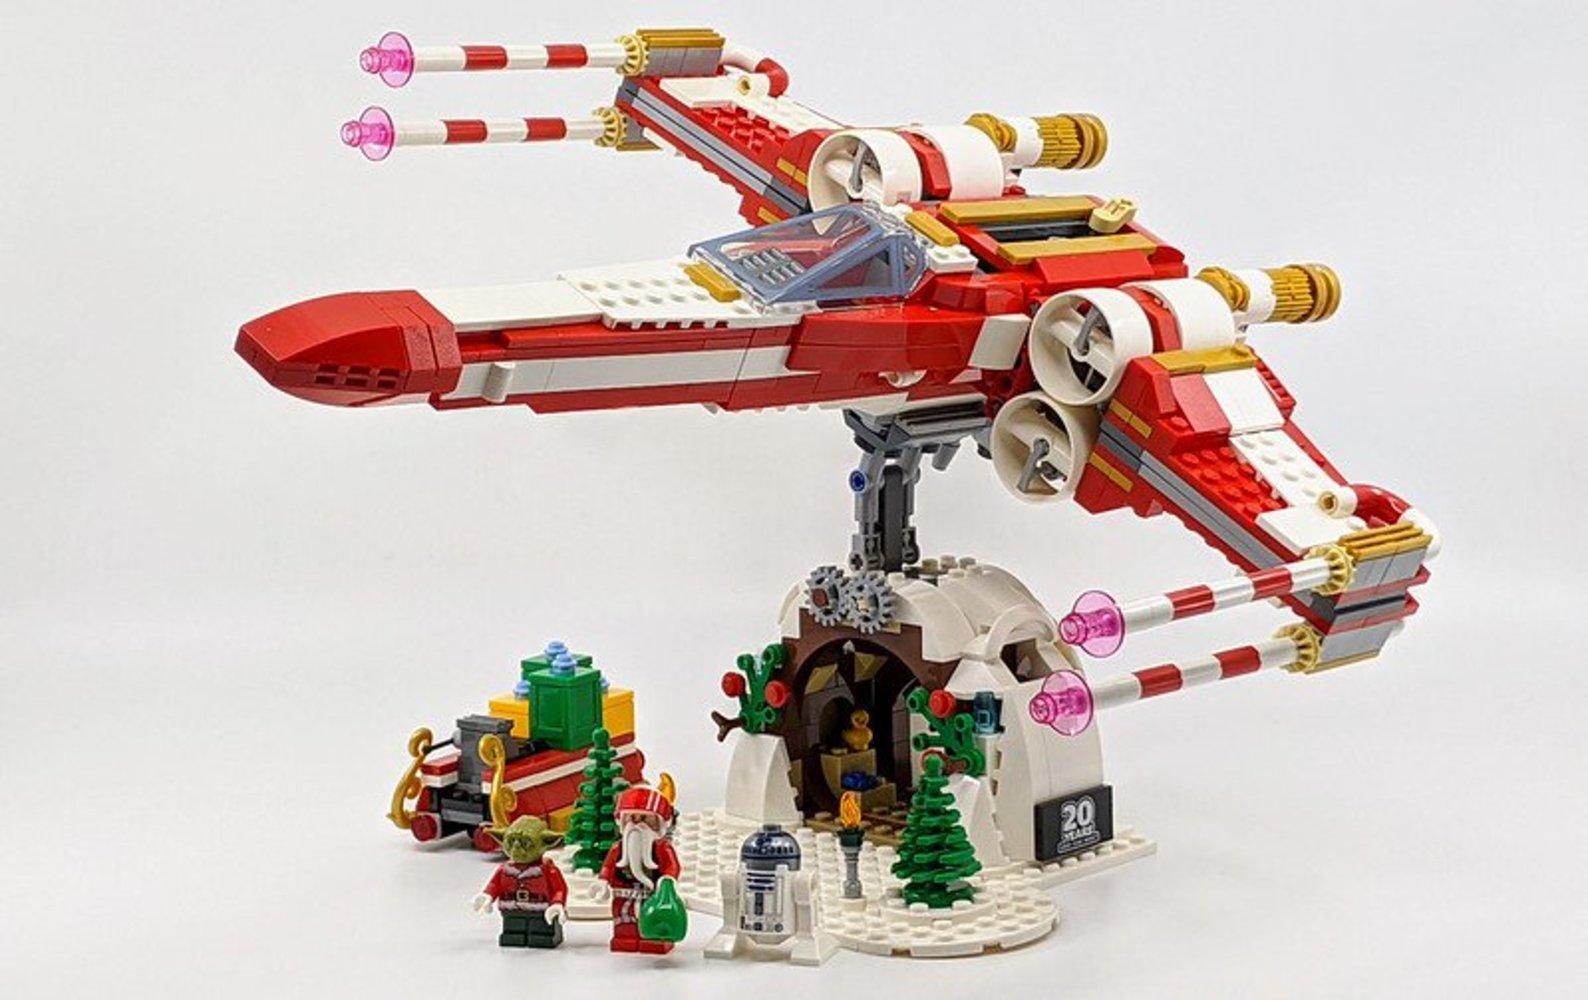 Yuletide Squadron Xmas-Wing Starfighter